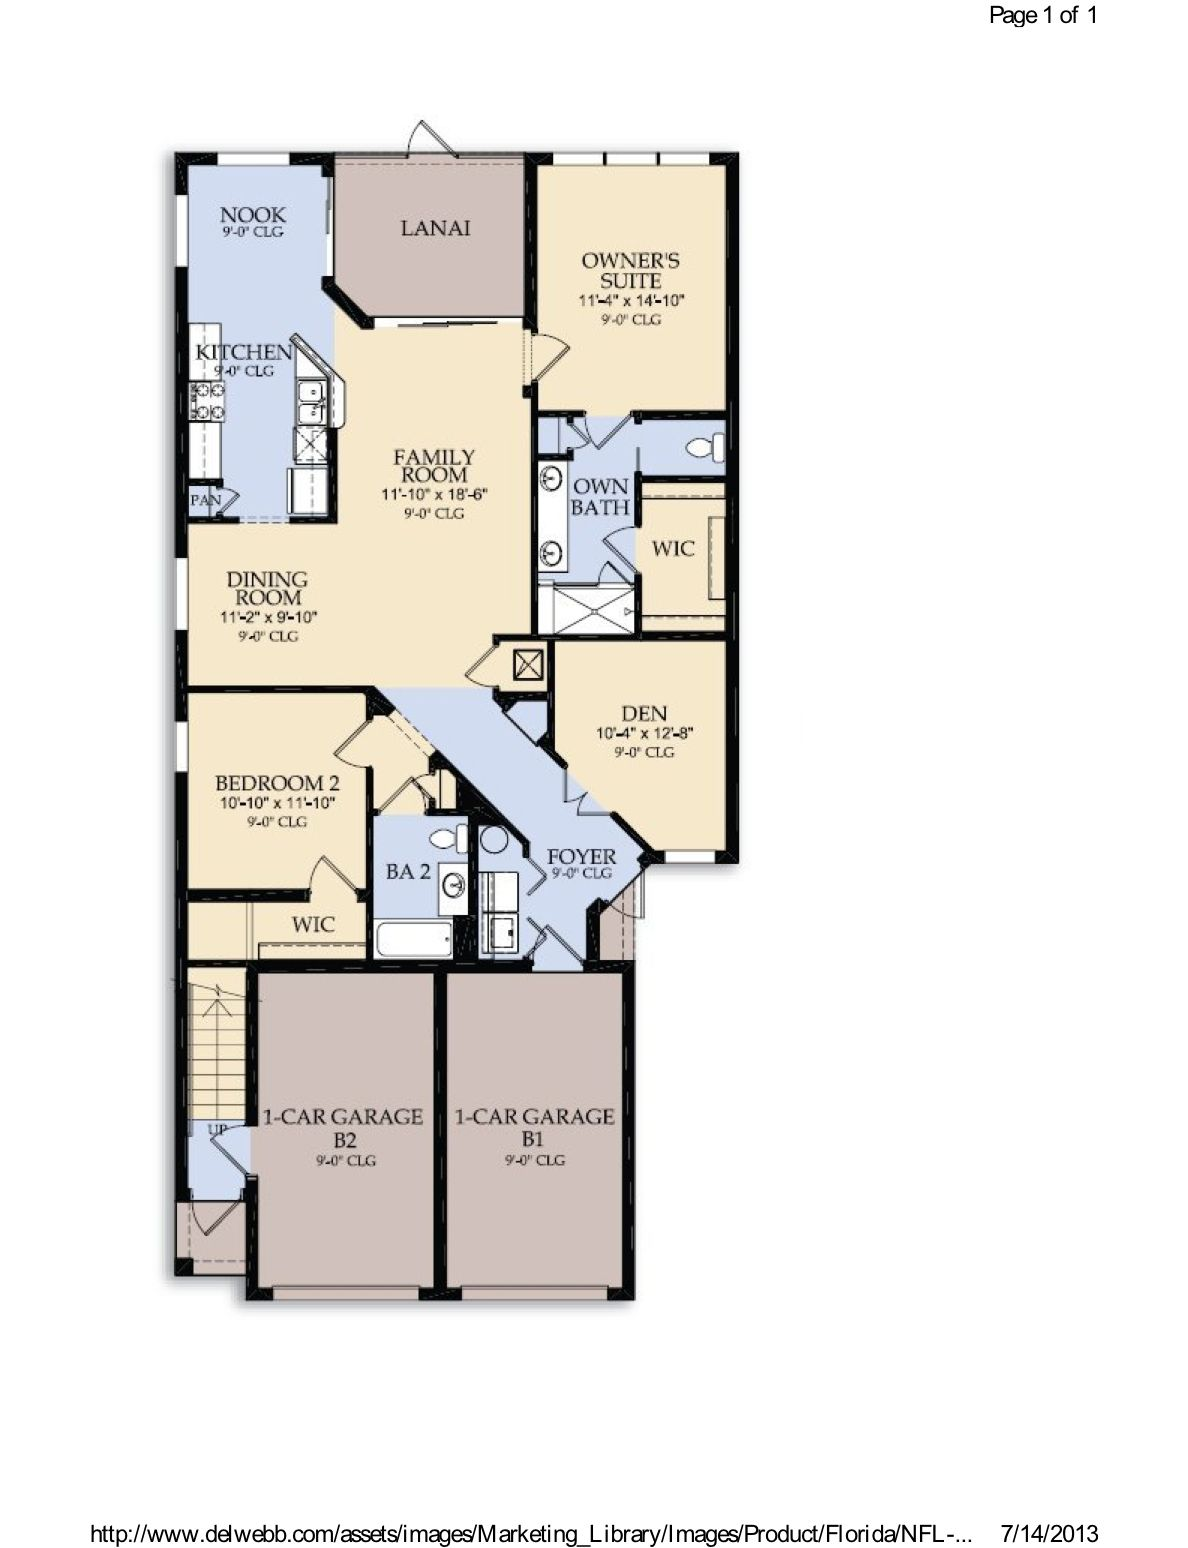 8ee23e6c923e08240595f593b50dd7ac - Merrill Gardens Champions Gate Floor Plans